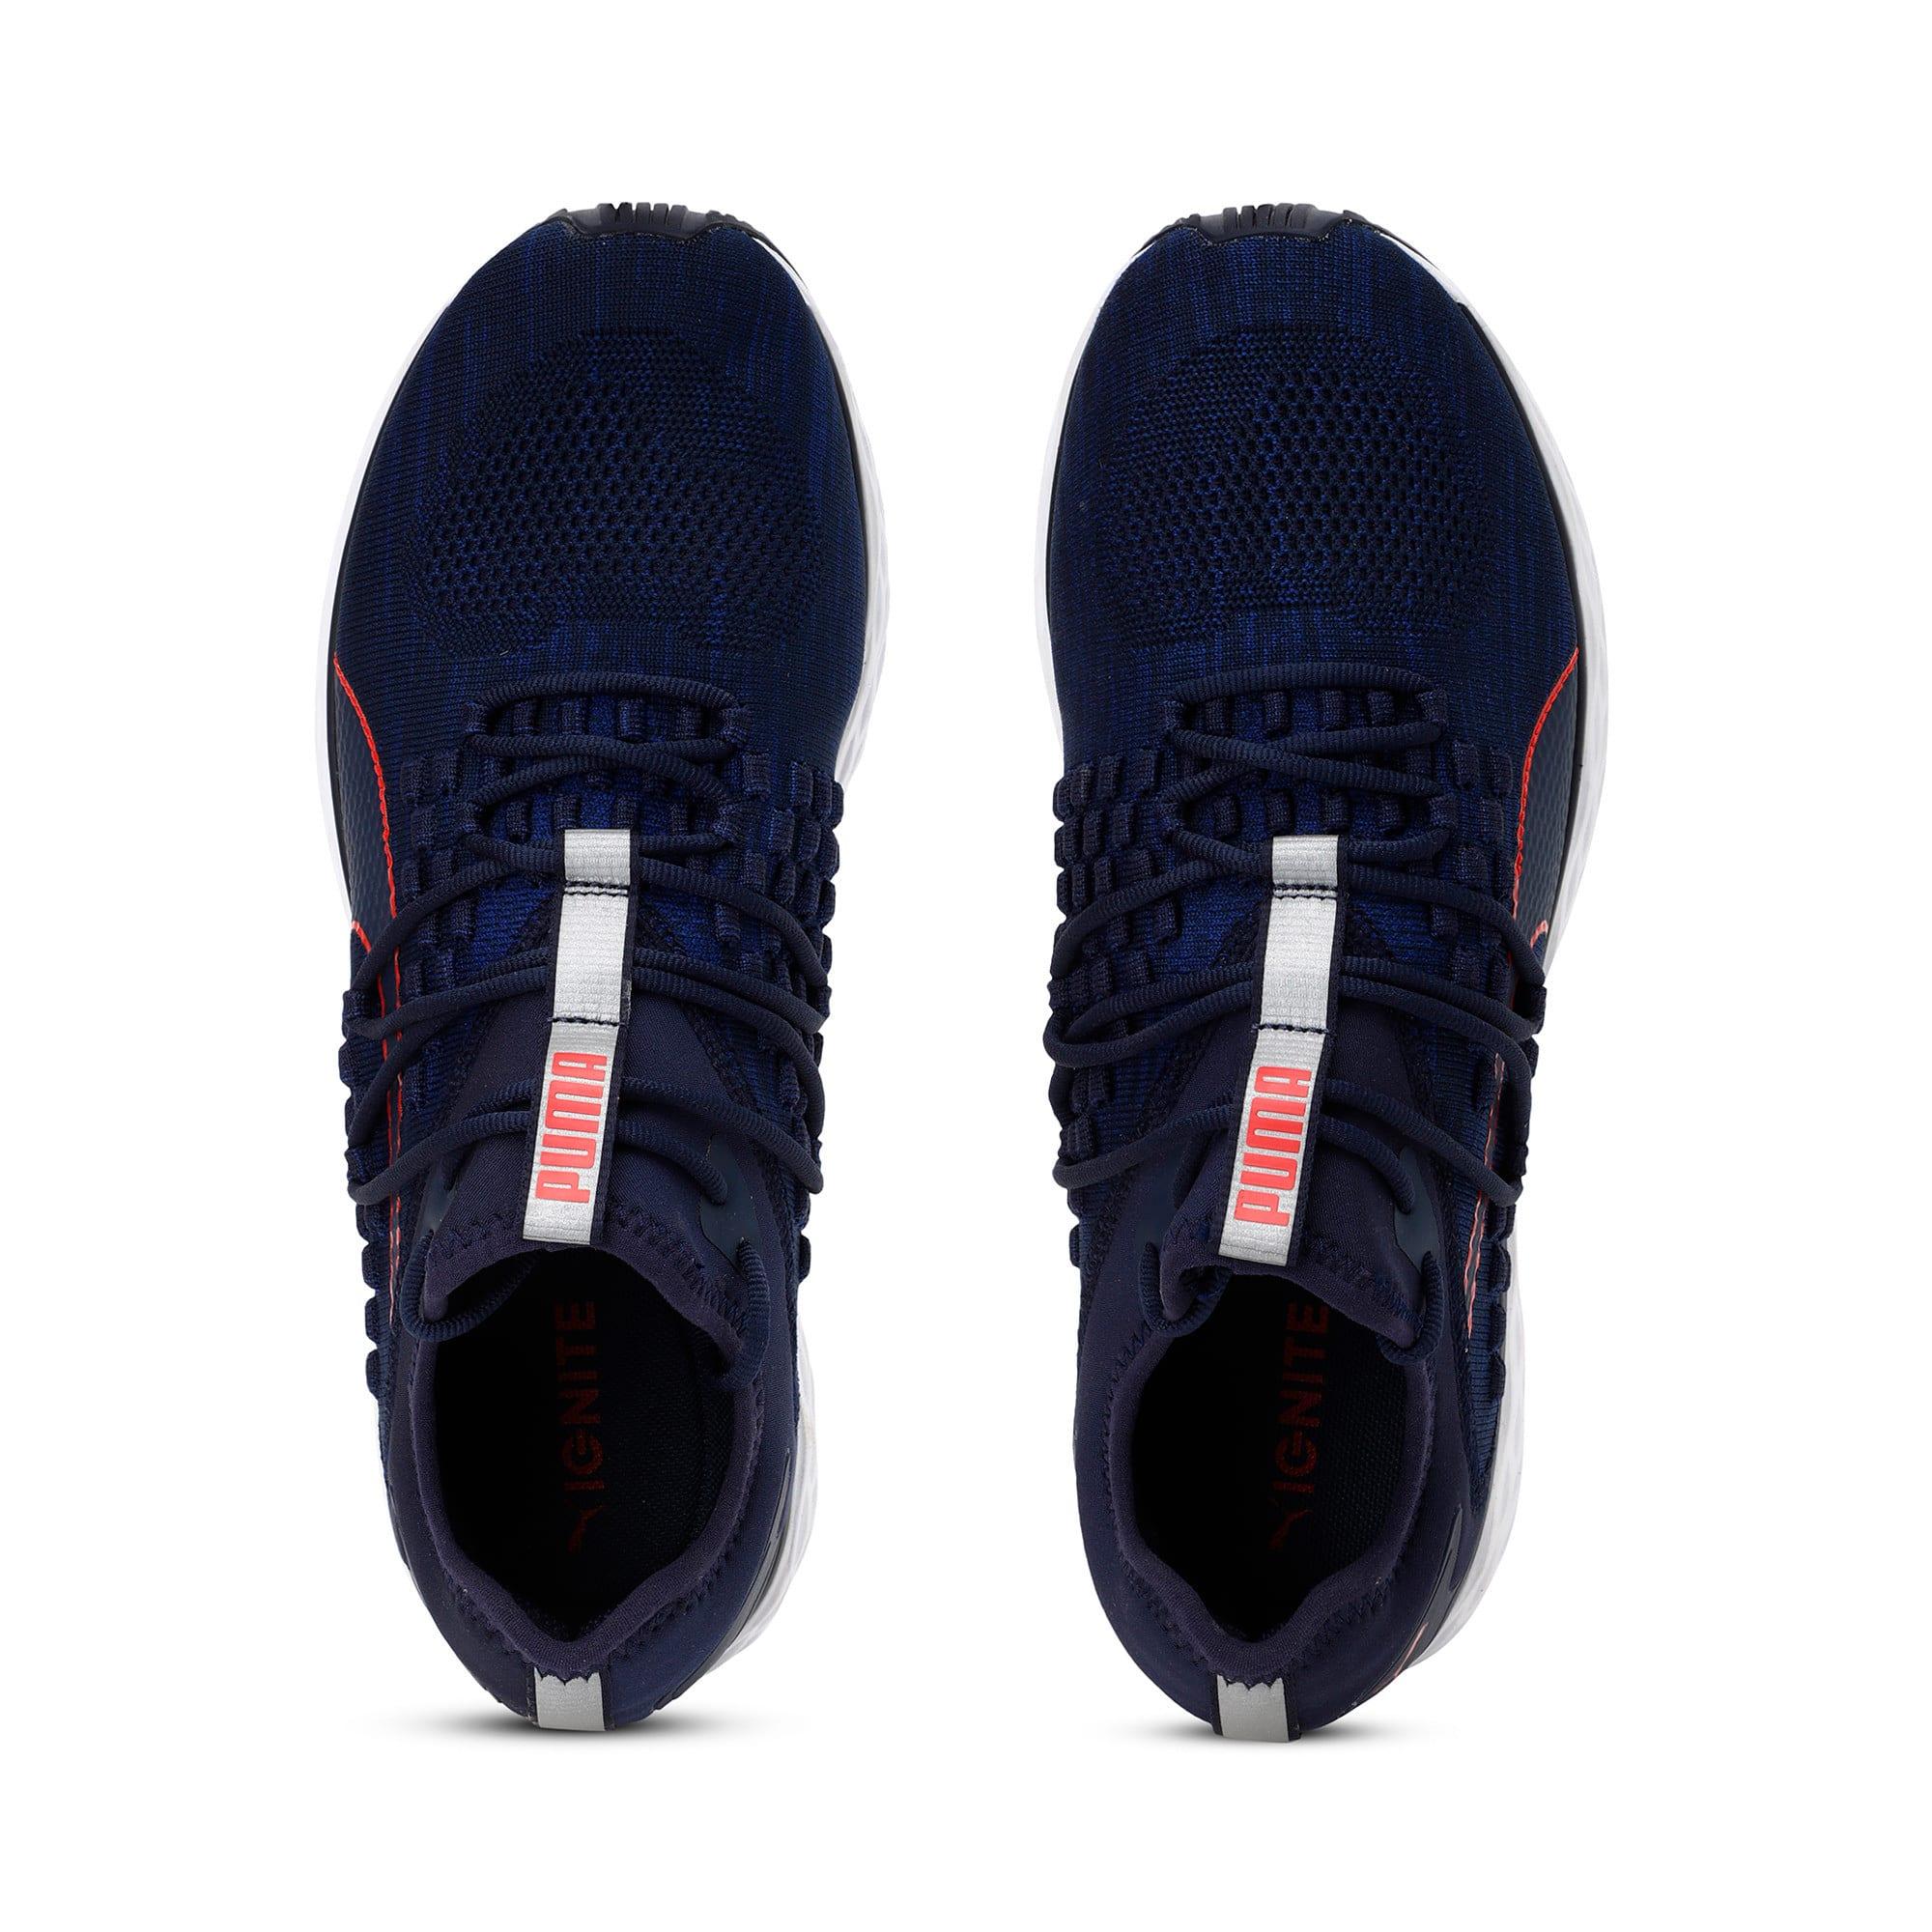 Thumbnail 6 of SPEED FUSEFIT Men's Running Shoes, Peacoat-Sodalite Blue, medium-IND